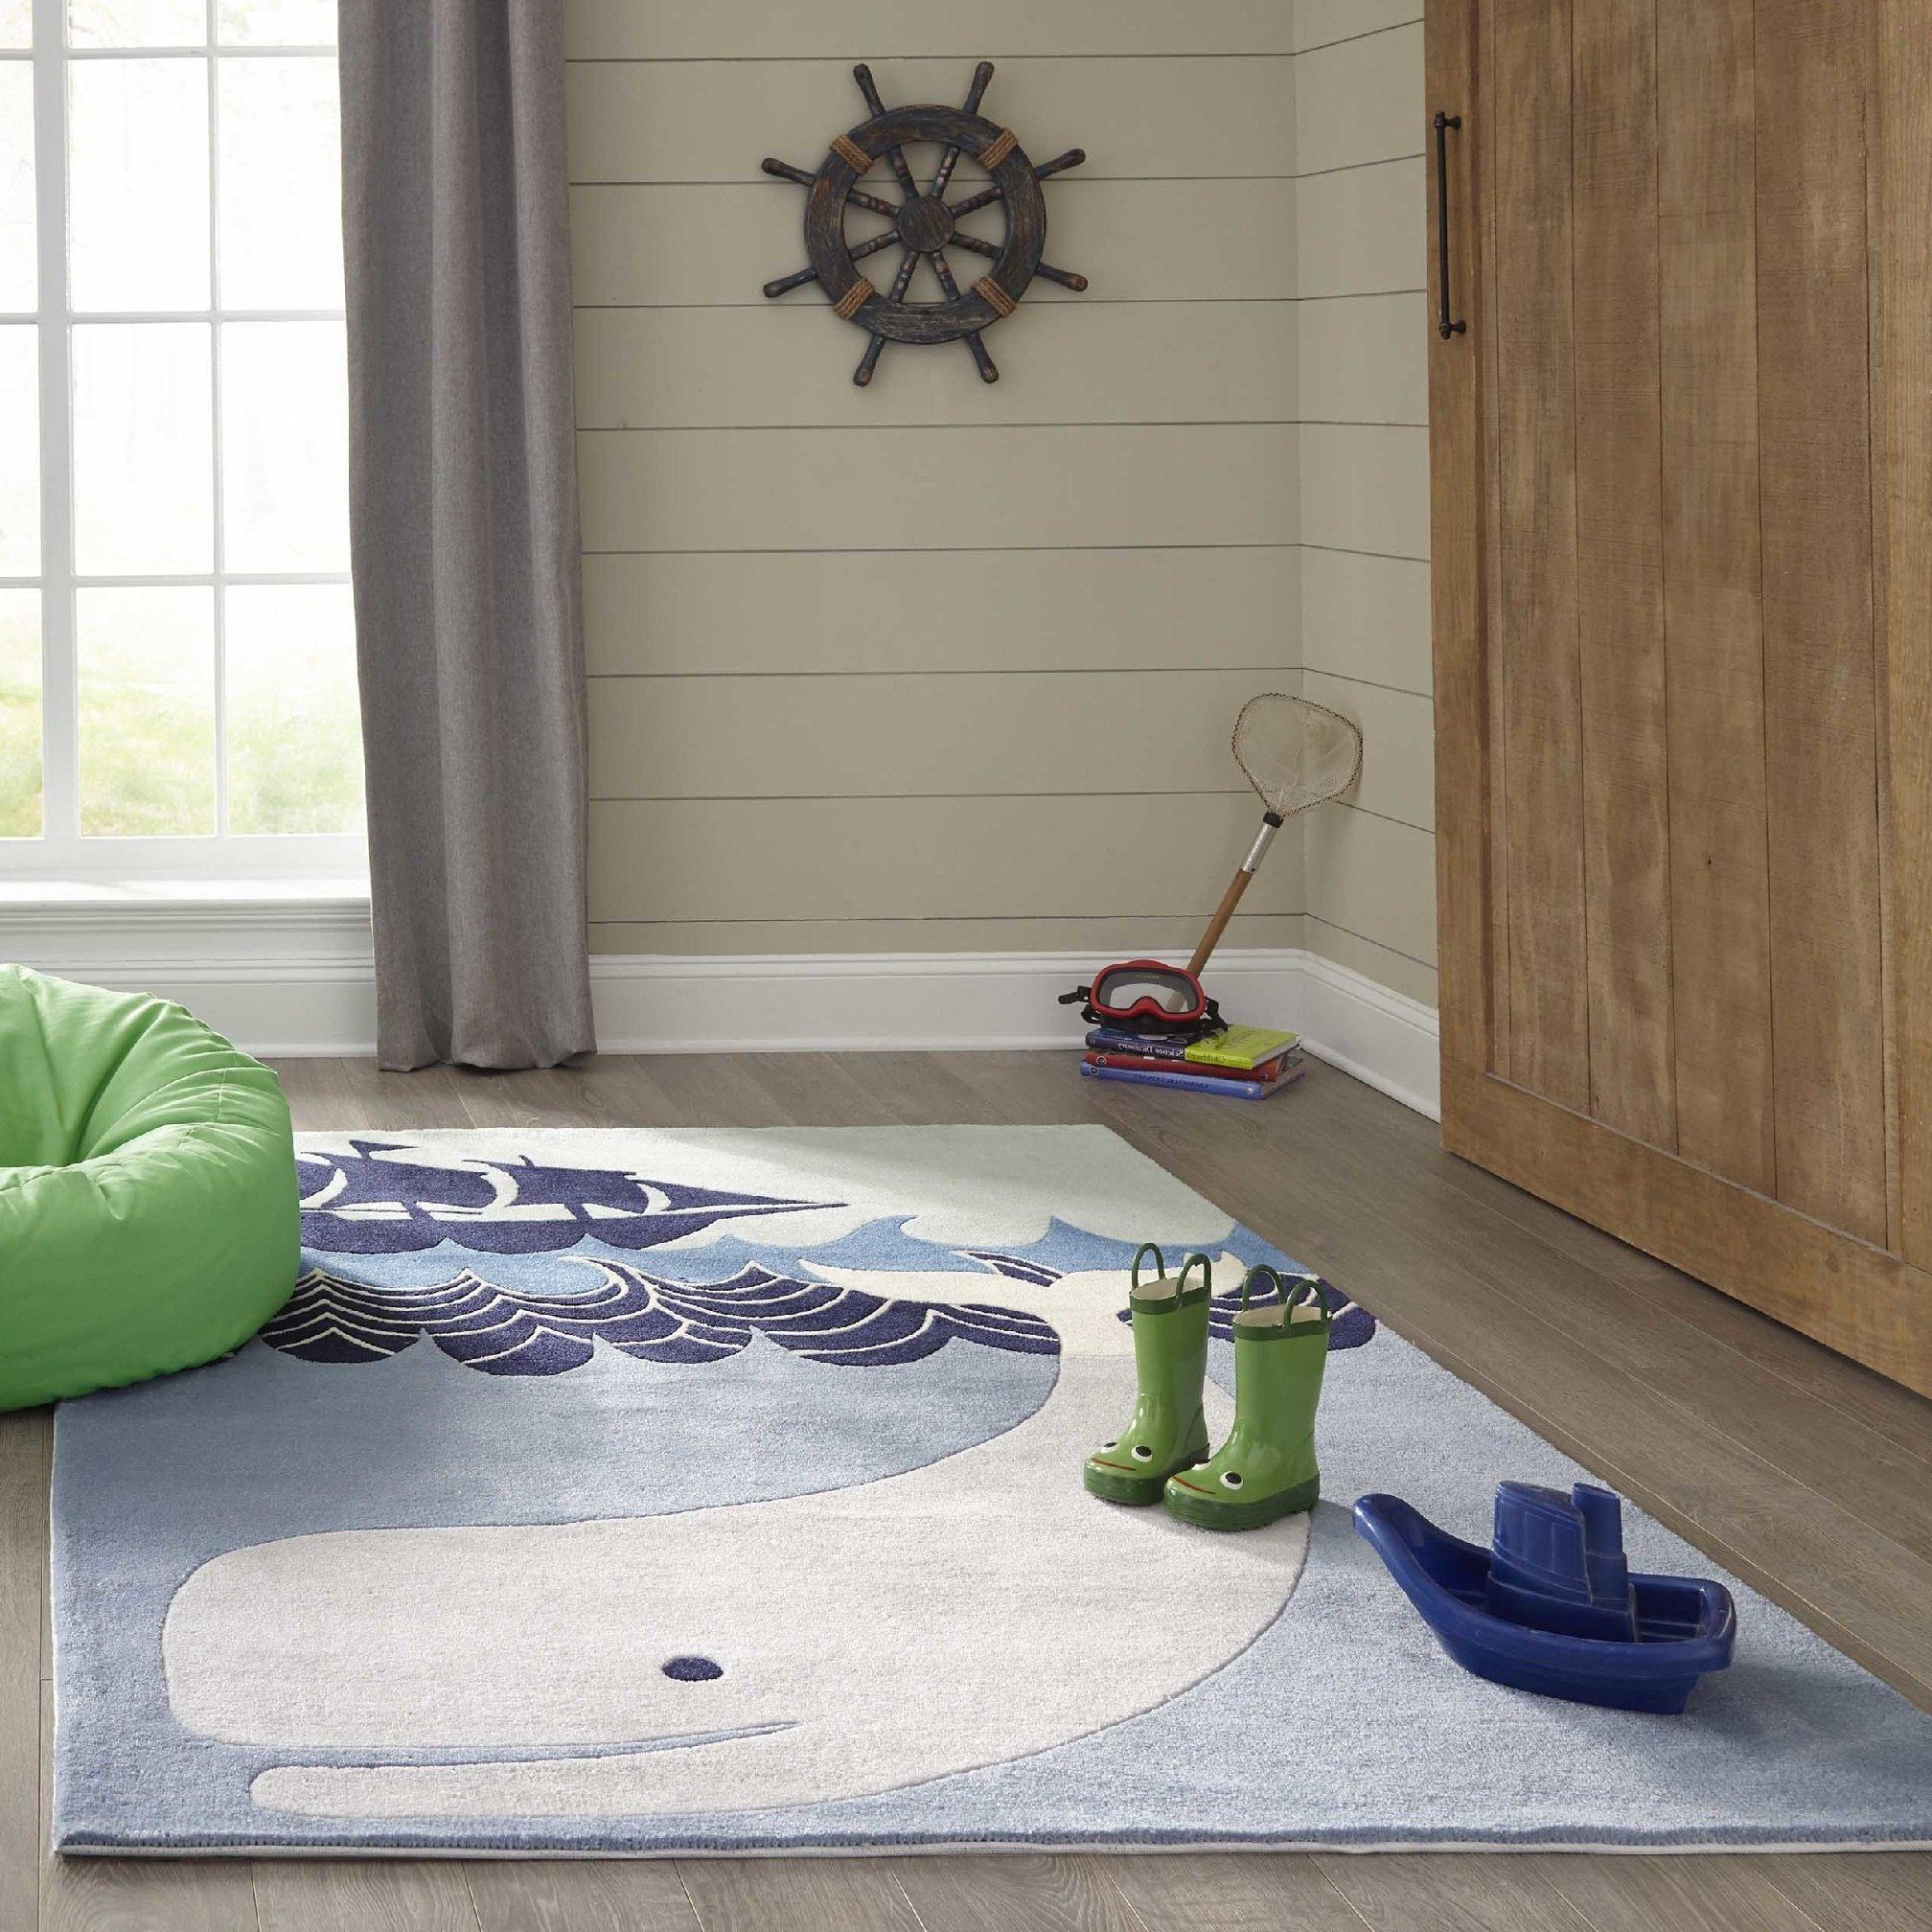 Fun Underwater Whale Motif Area Rug, Nautical Geometric Ocean Waves Pattern, Rectangle Indoor Living Room Doorway Hallway Kids Bedroom Carpet, Lush Trendy Sea Animals Themed, Navy, Blue, Size 3' x 5'